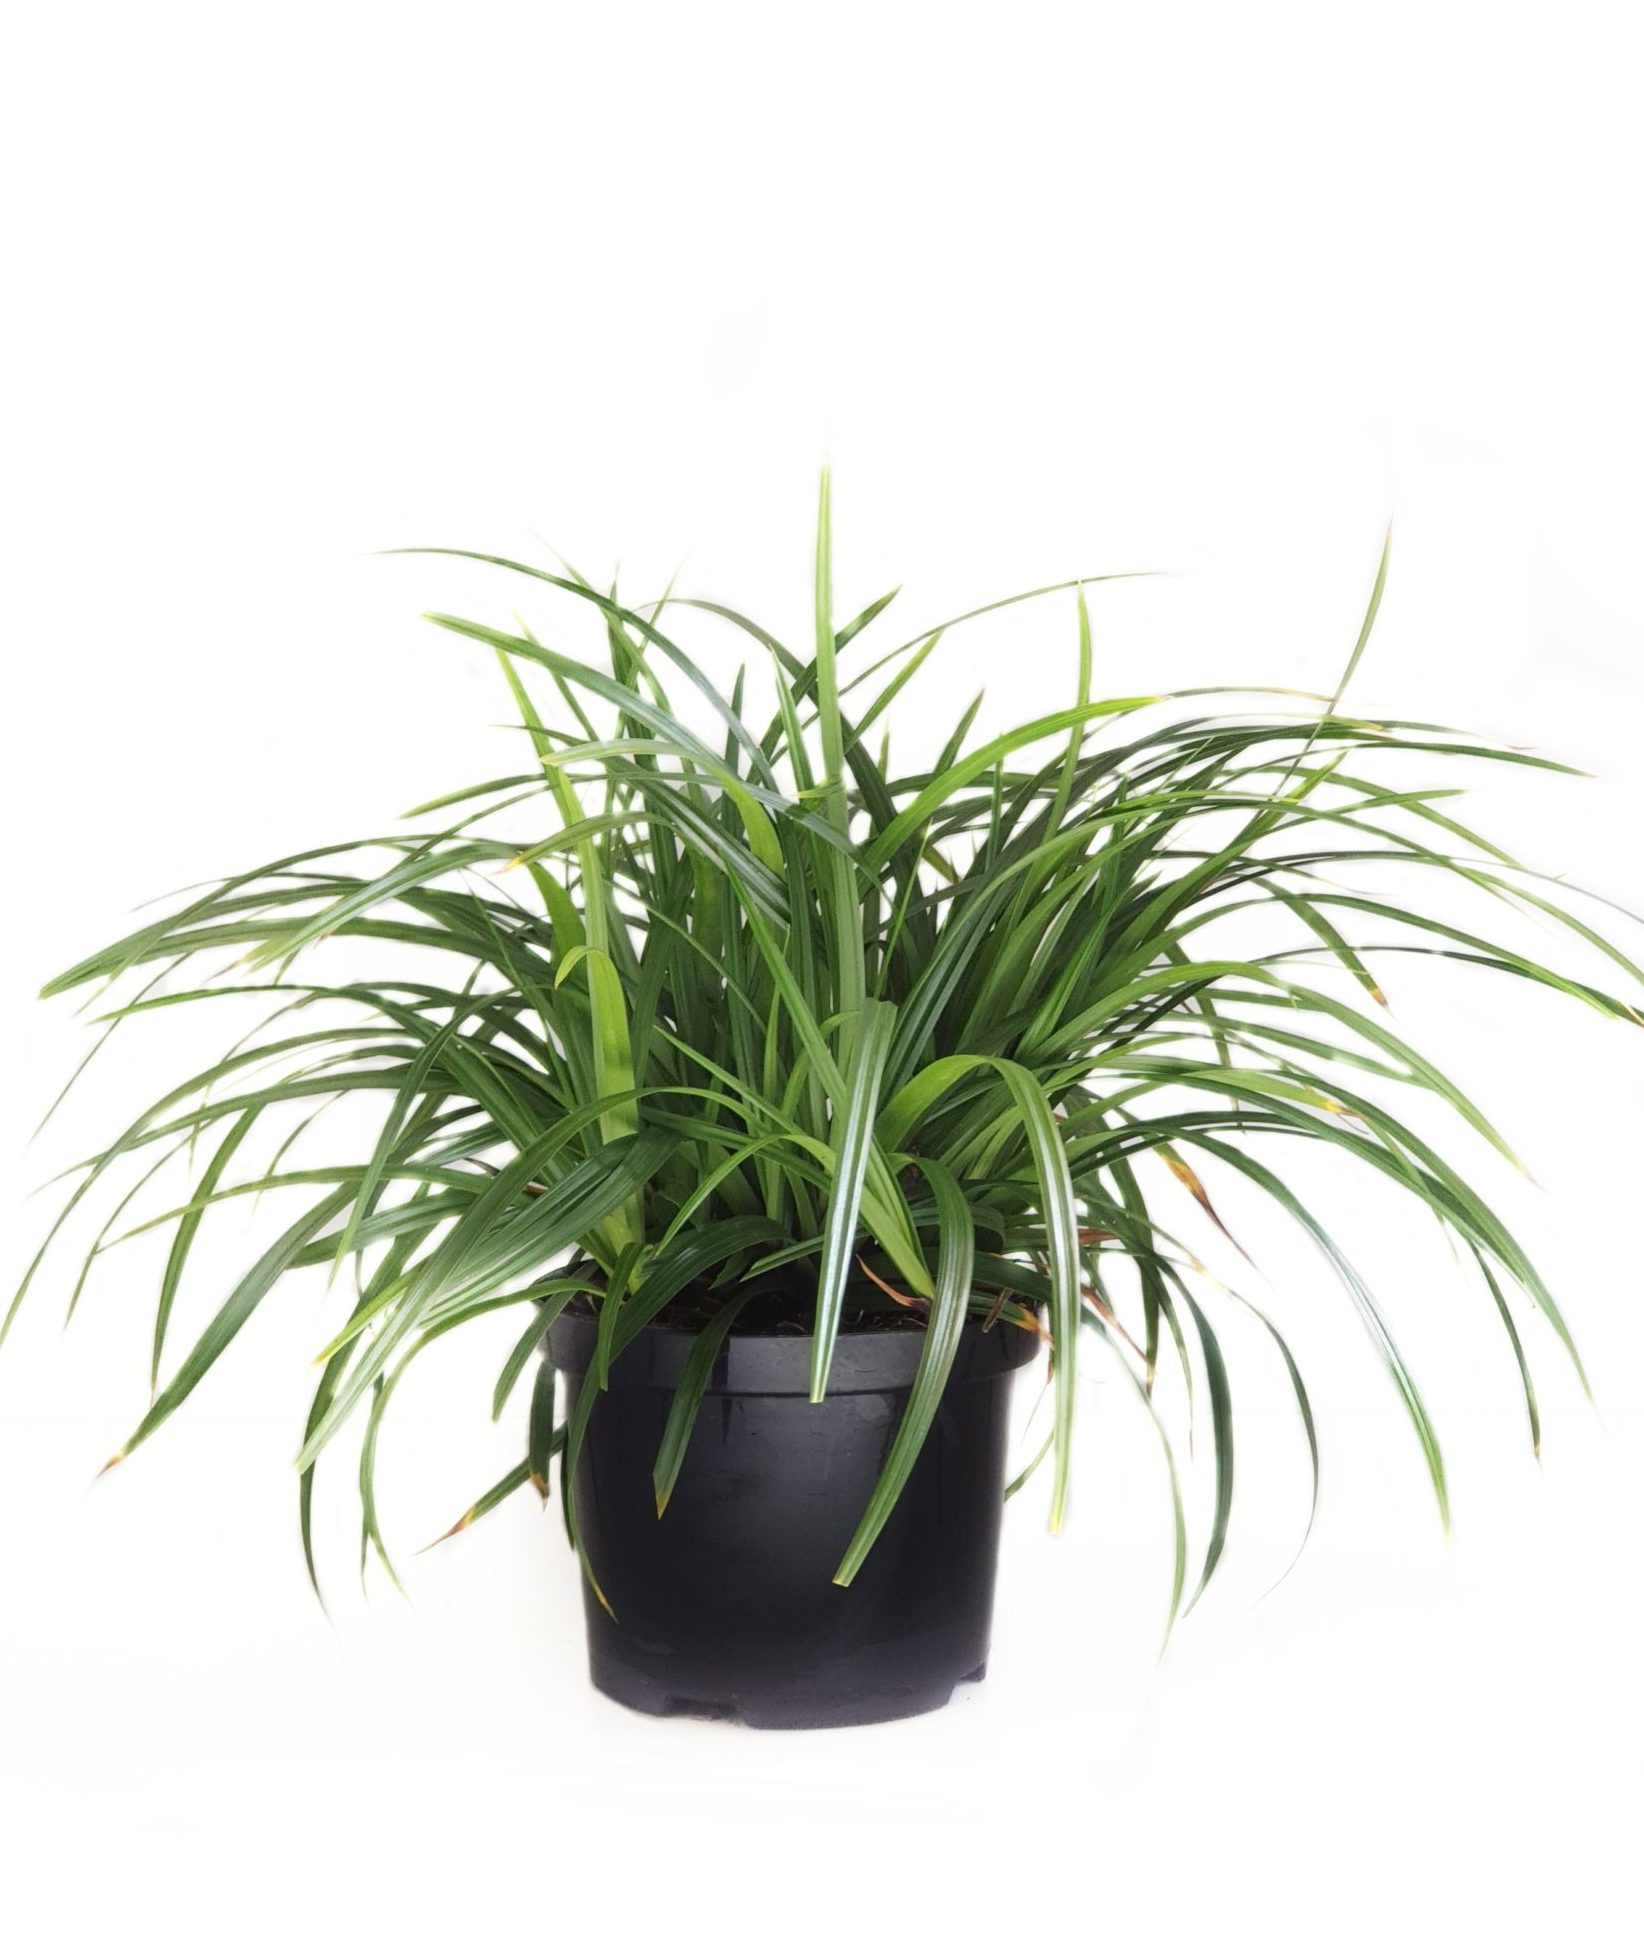 Carex 'Irish Green' pot 2 liter